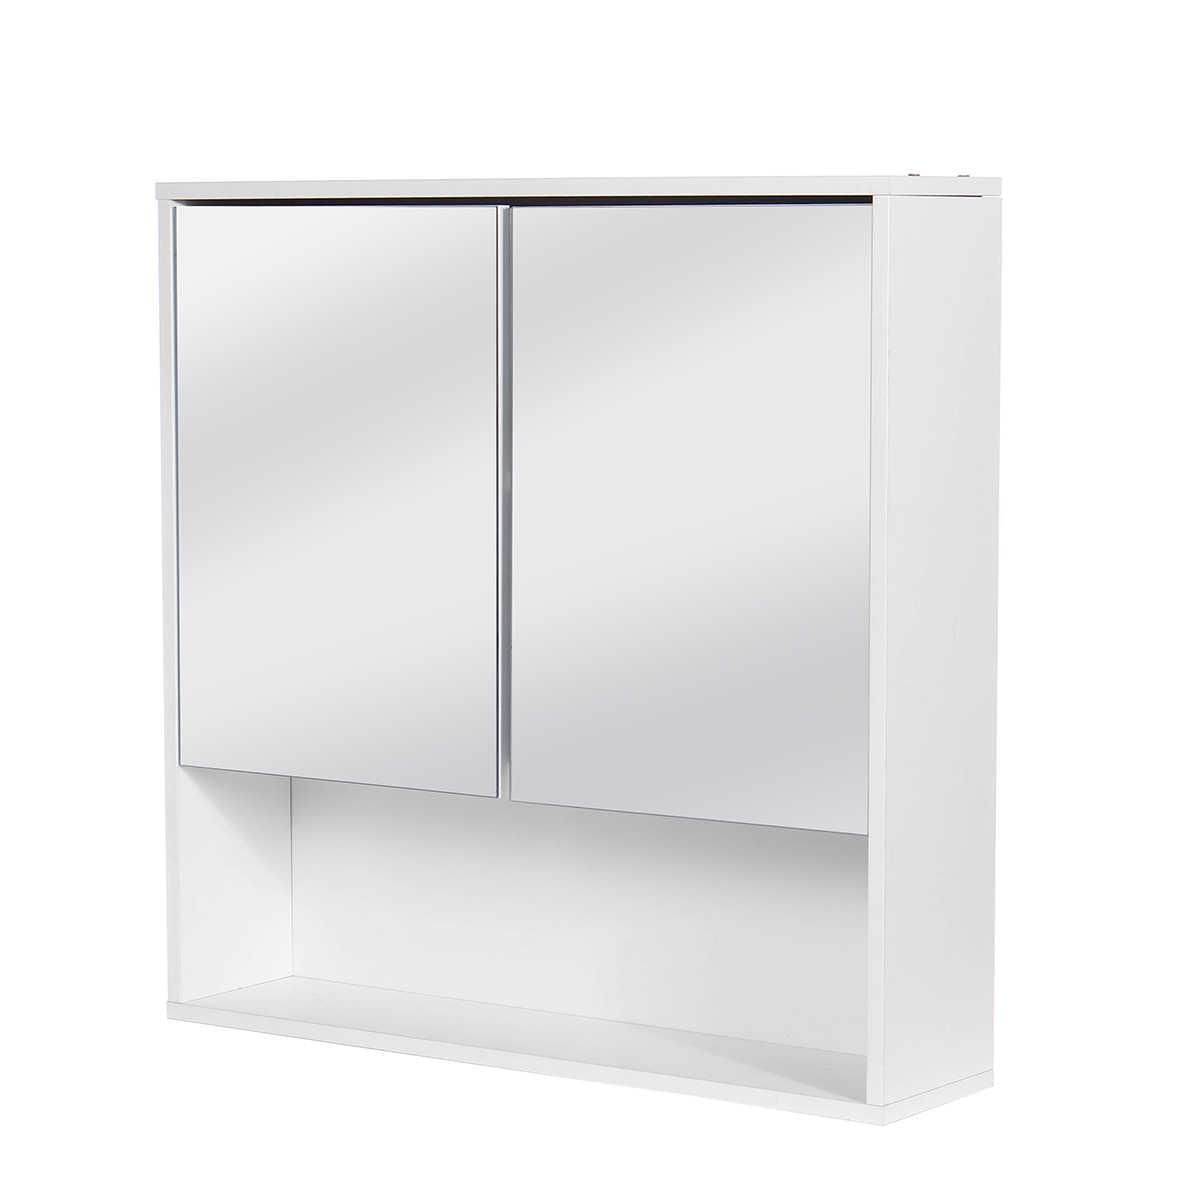 60x60cm Bathroom Cabinet Wall Mounted Bathroom Mirror Cabinetstoilet Furniture Cupboard Shelf Storager Modern Style Uk Stock Aliexpress